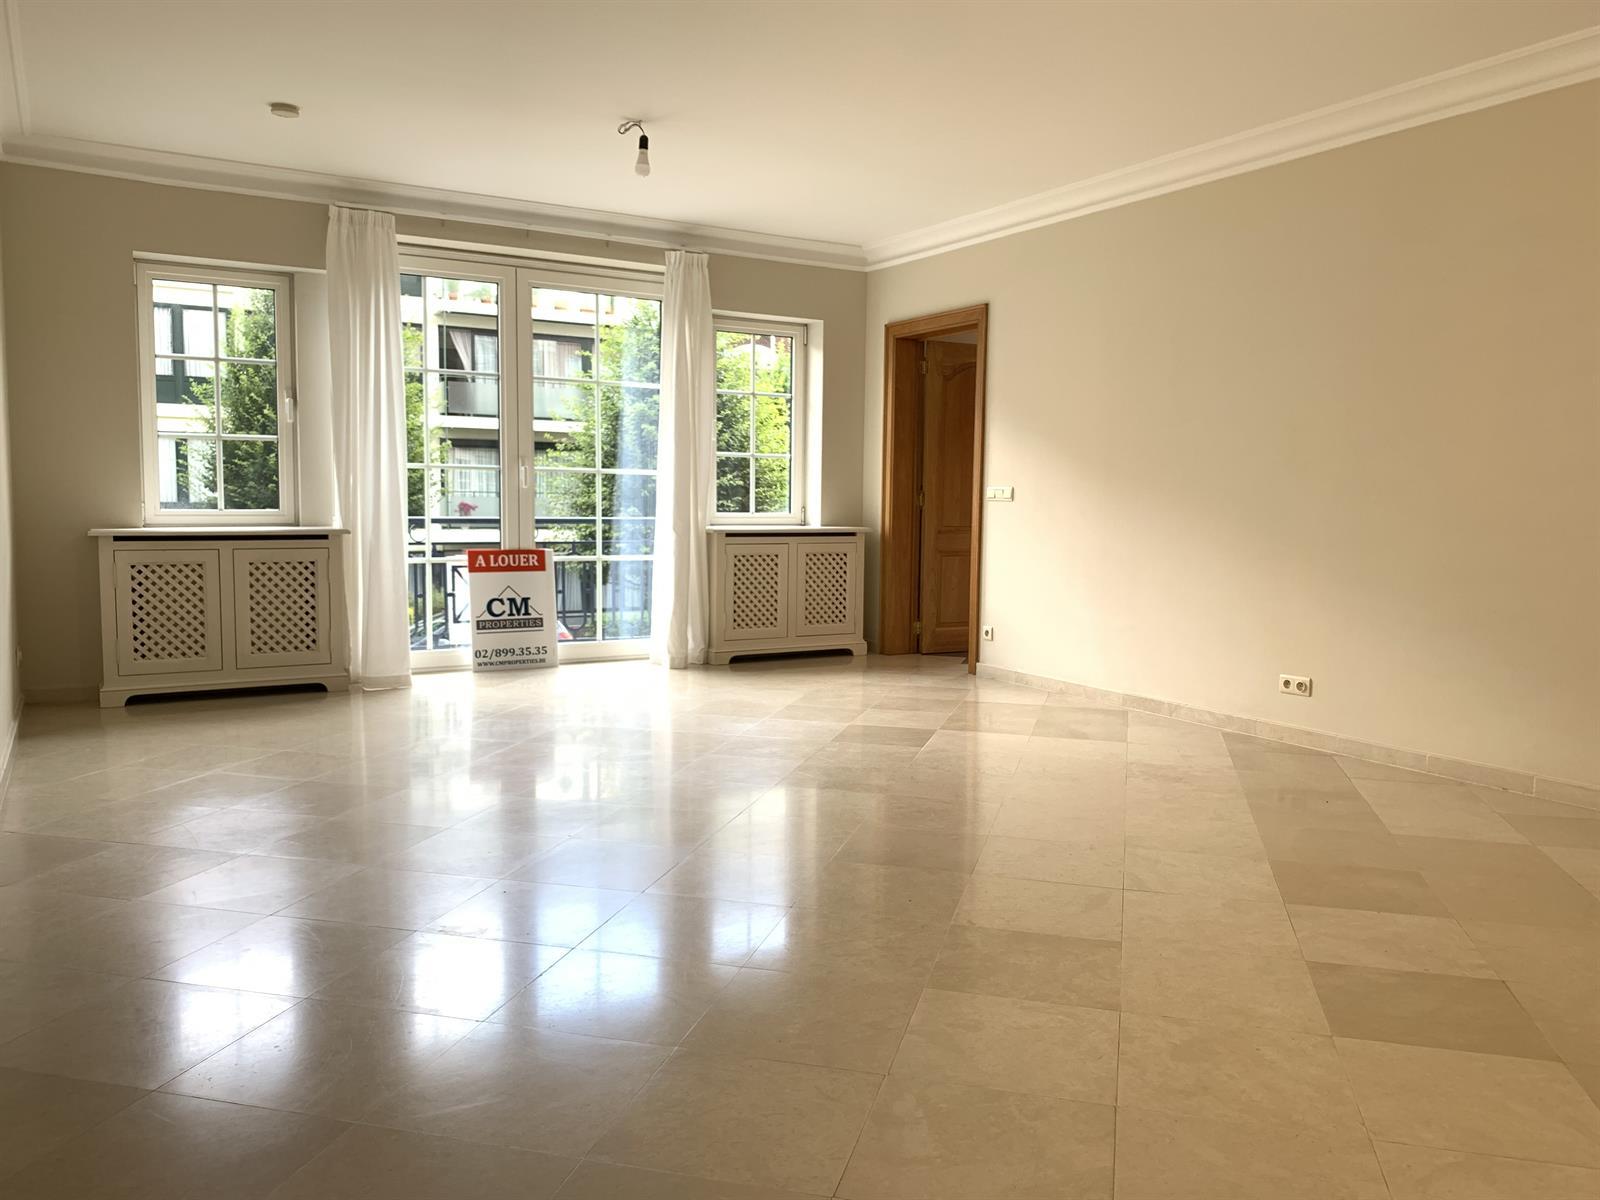 Appartement exceptionnel - Woluwe-Saint-Pierre - #4433539-20